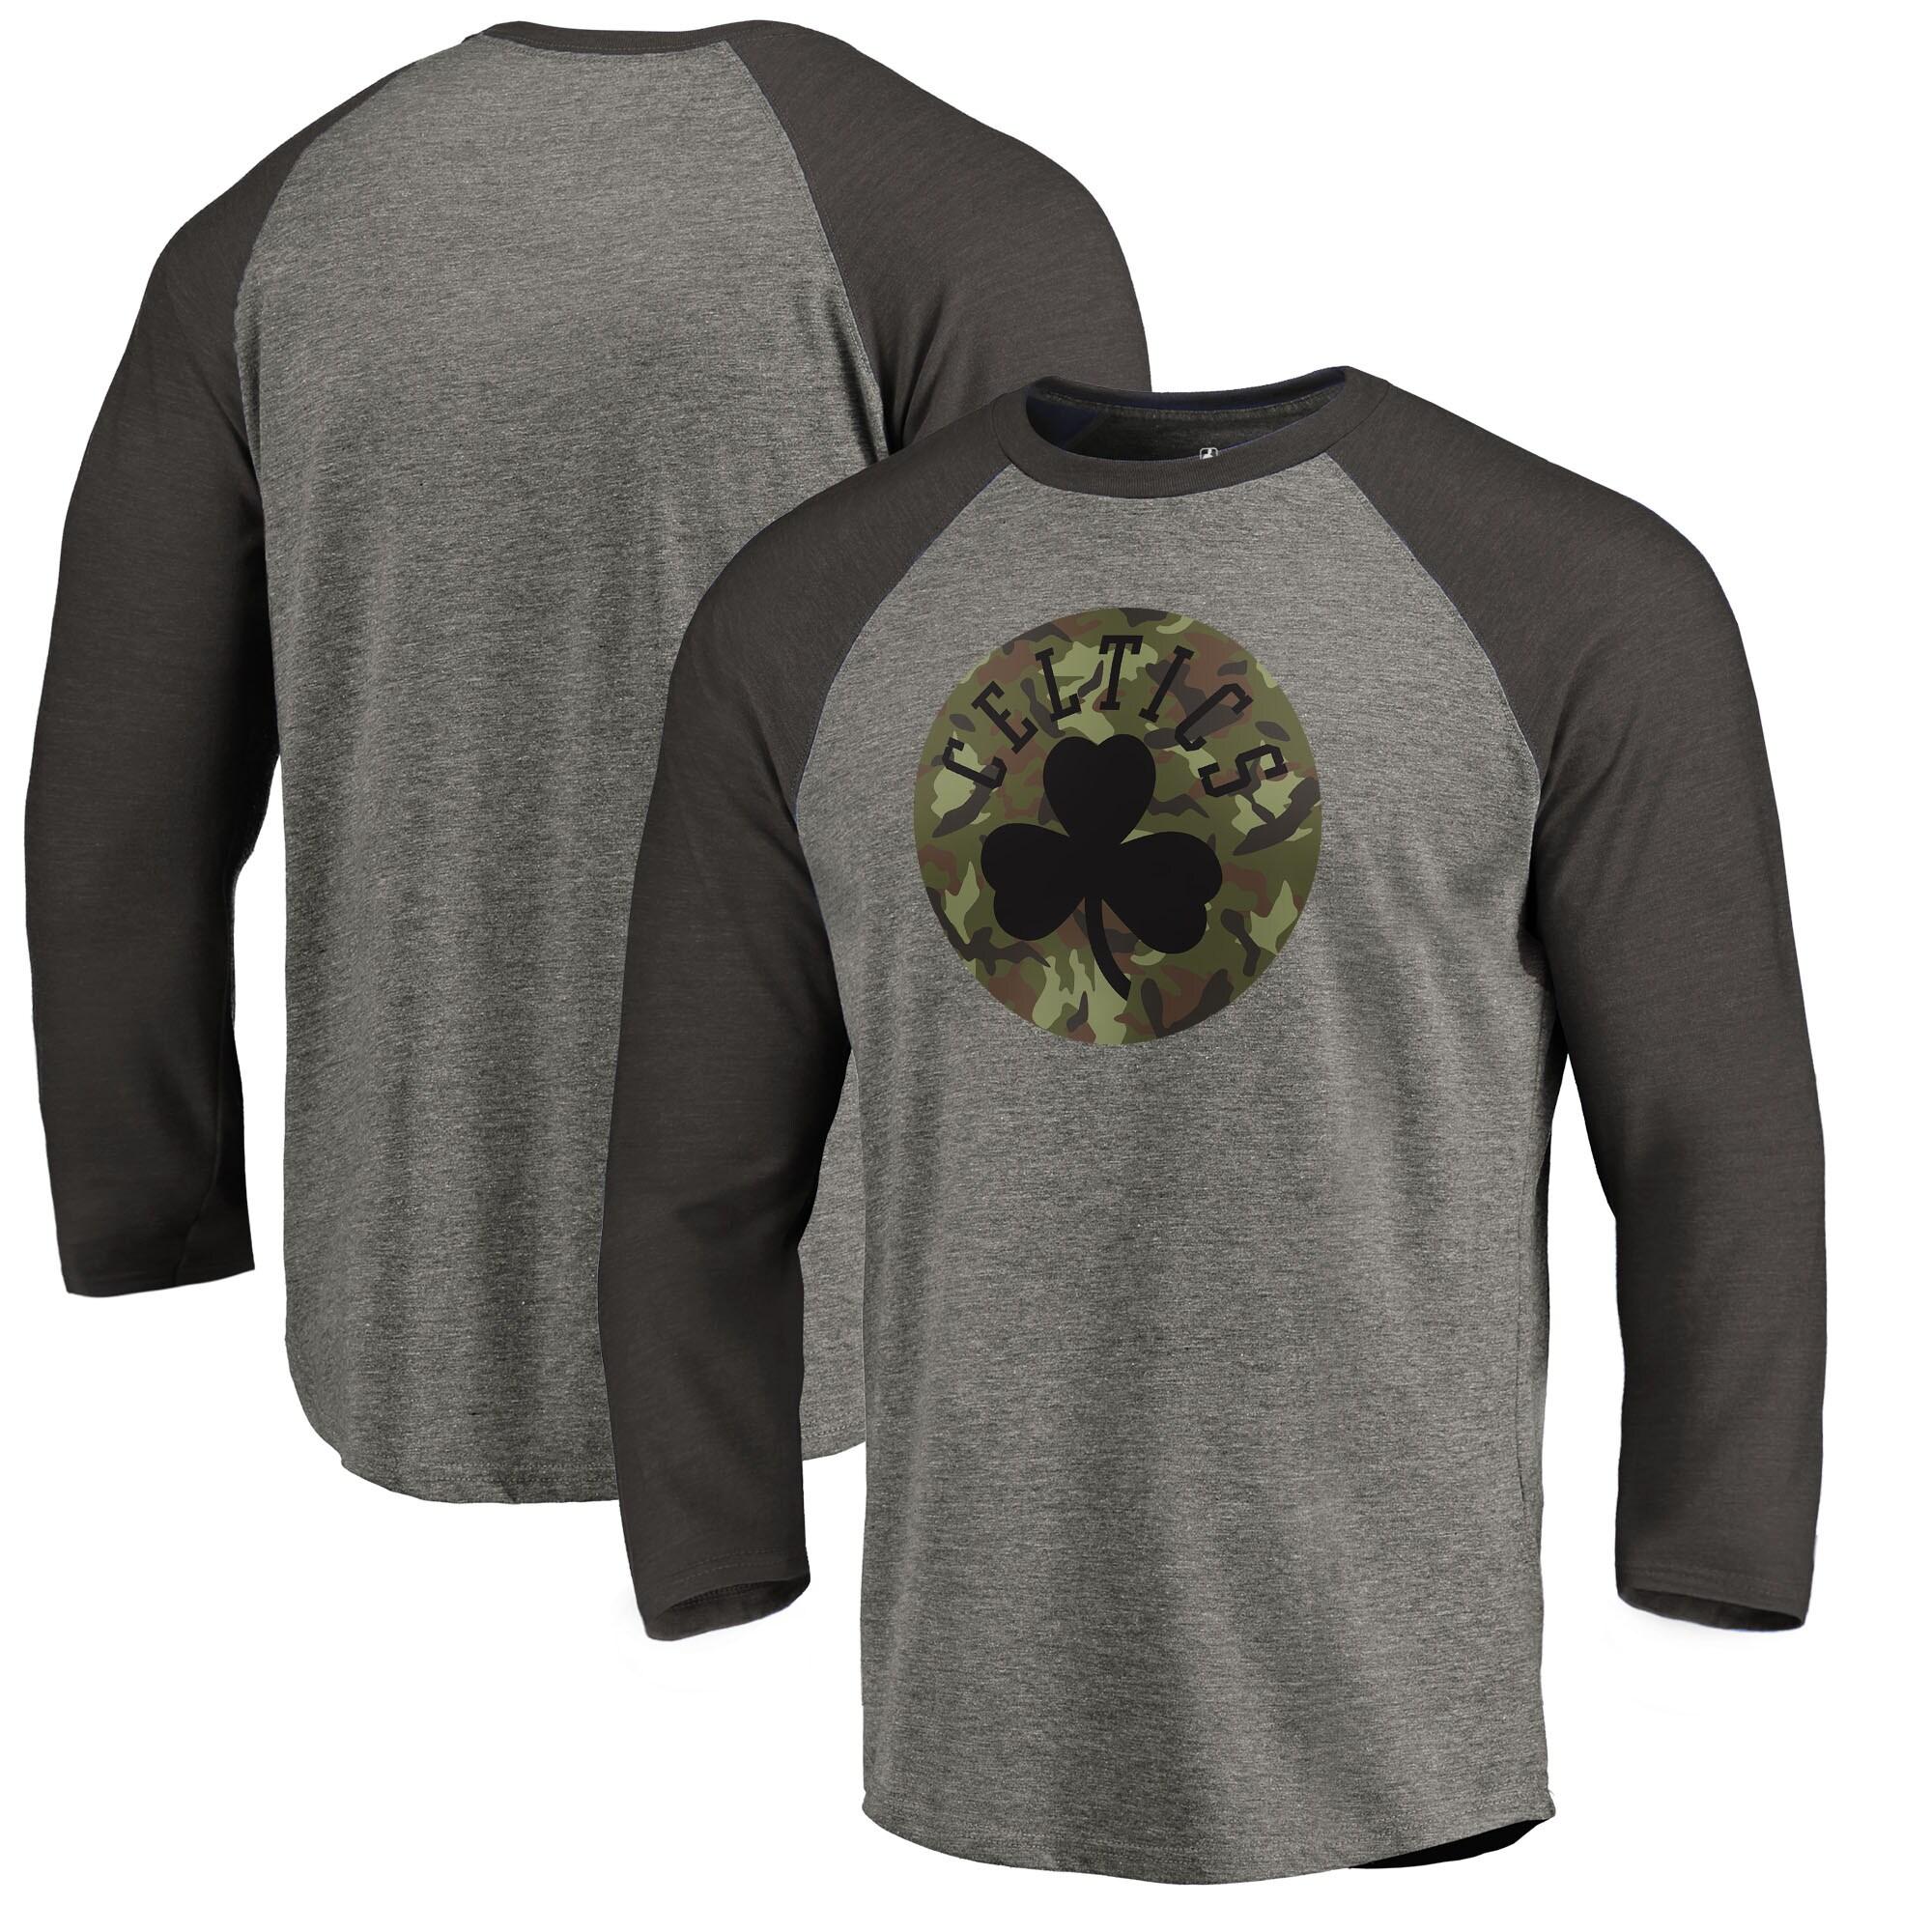 Boston Celtics Fanatics Branded Camo Collection Prestige Raglan 3/4-Sleeve T-Shirt - Heathered Gray